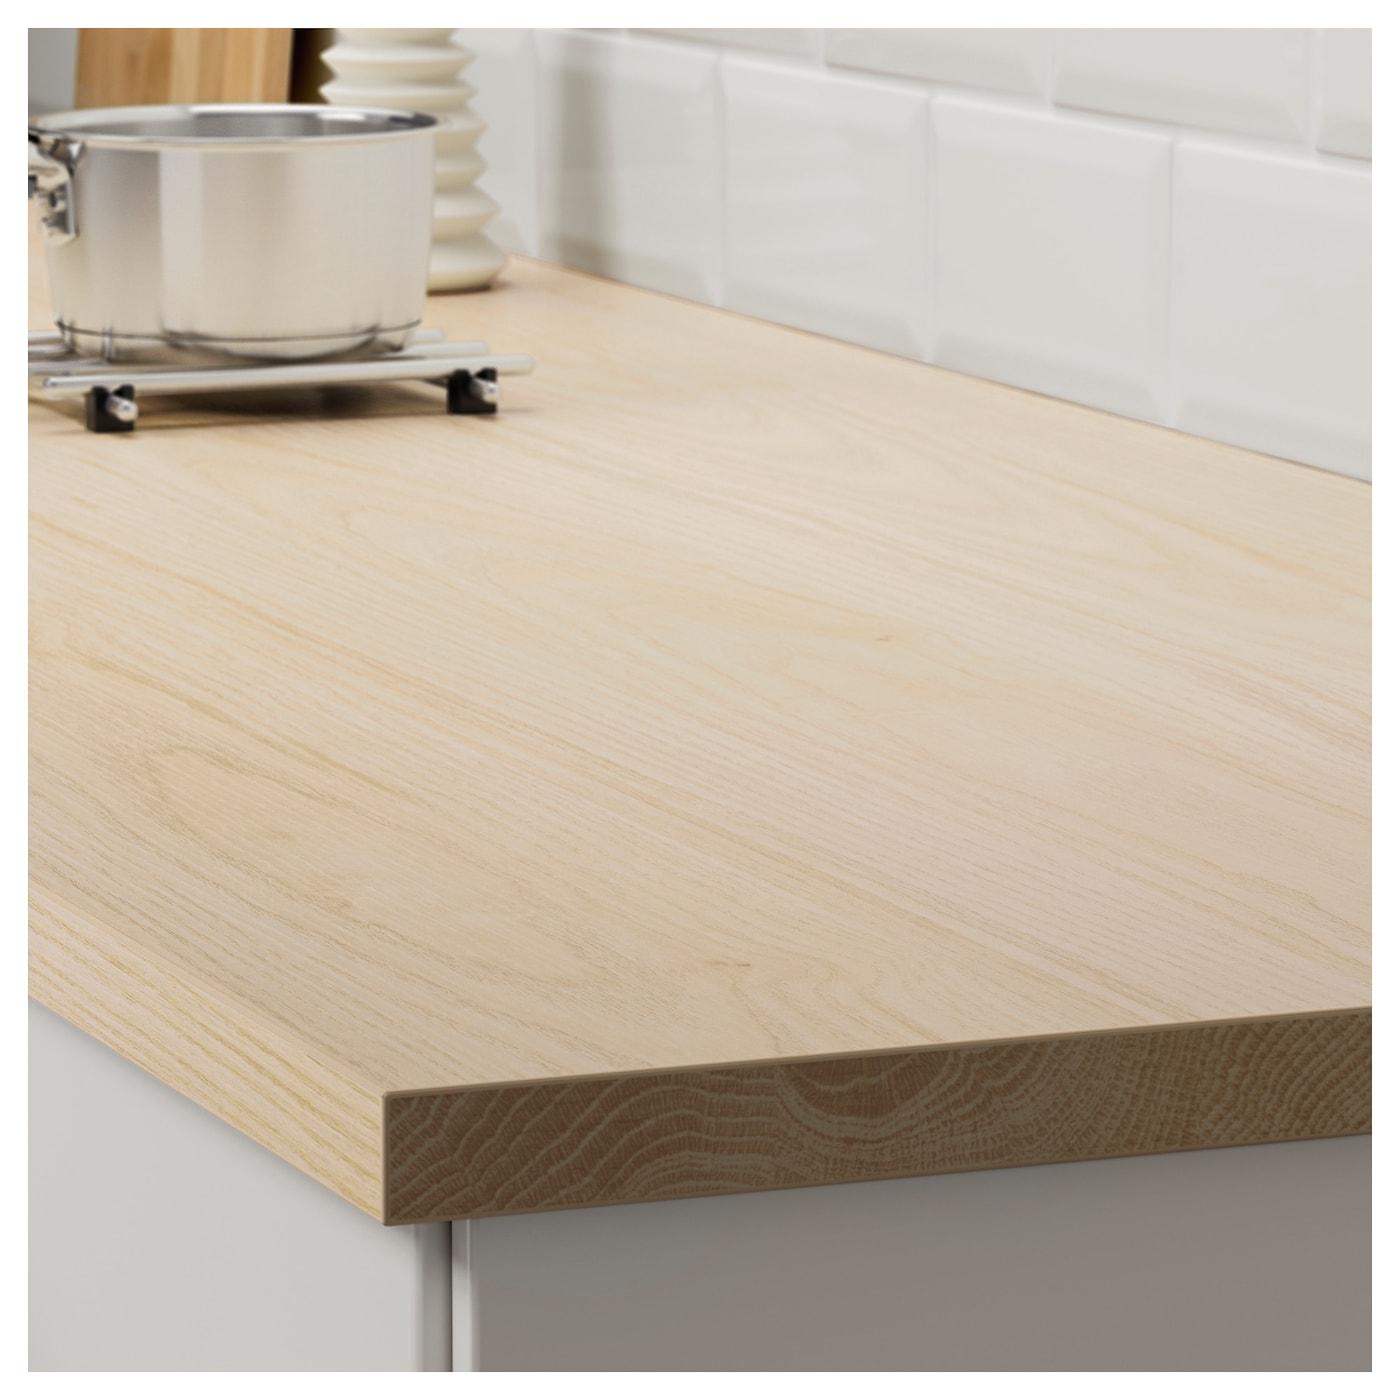 ekbacken plan de travail sur mesure d cor fr ne stratifi 63 6 125x2 8 cm ikea. Black Bedroom Furniture Sets. Home Design Ideas